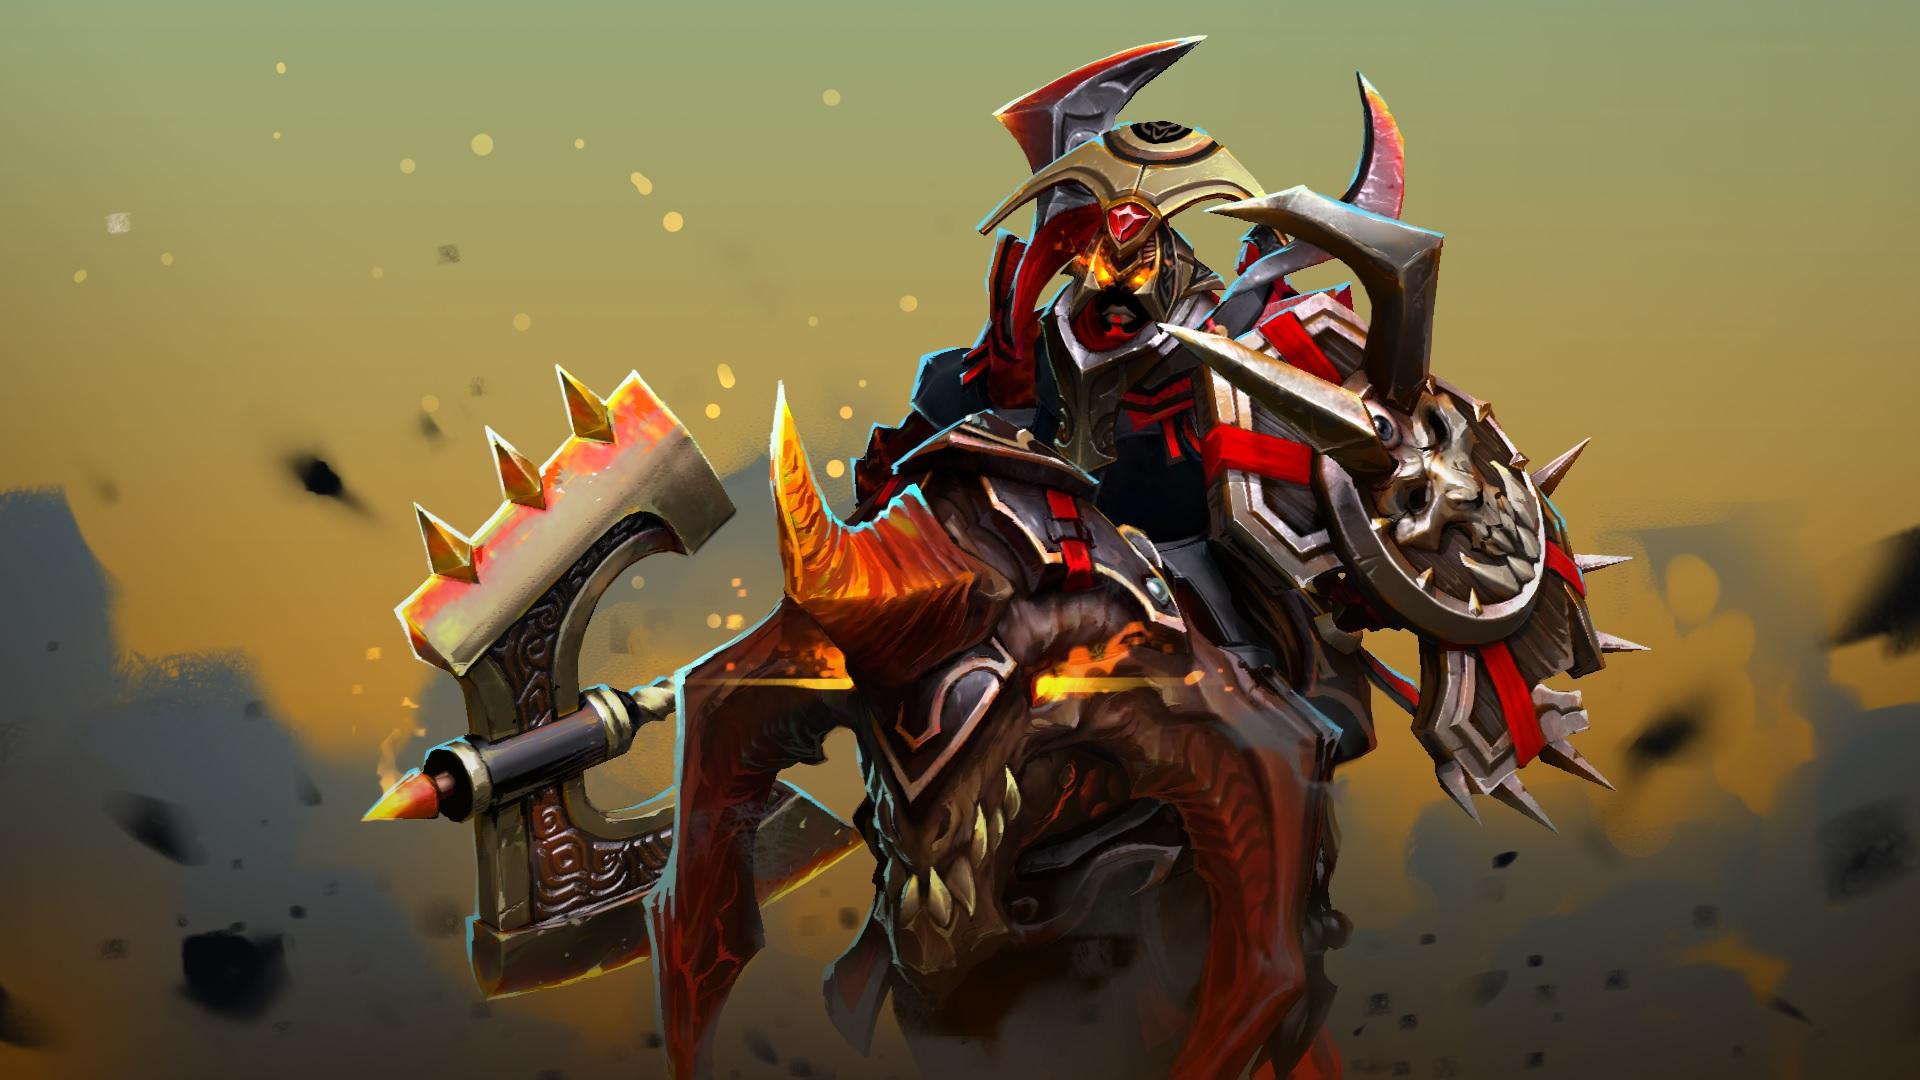 Chaos Knight Wallpapers Dota2